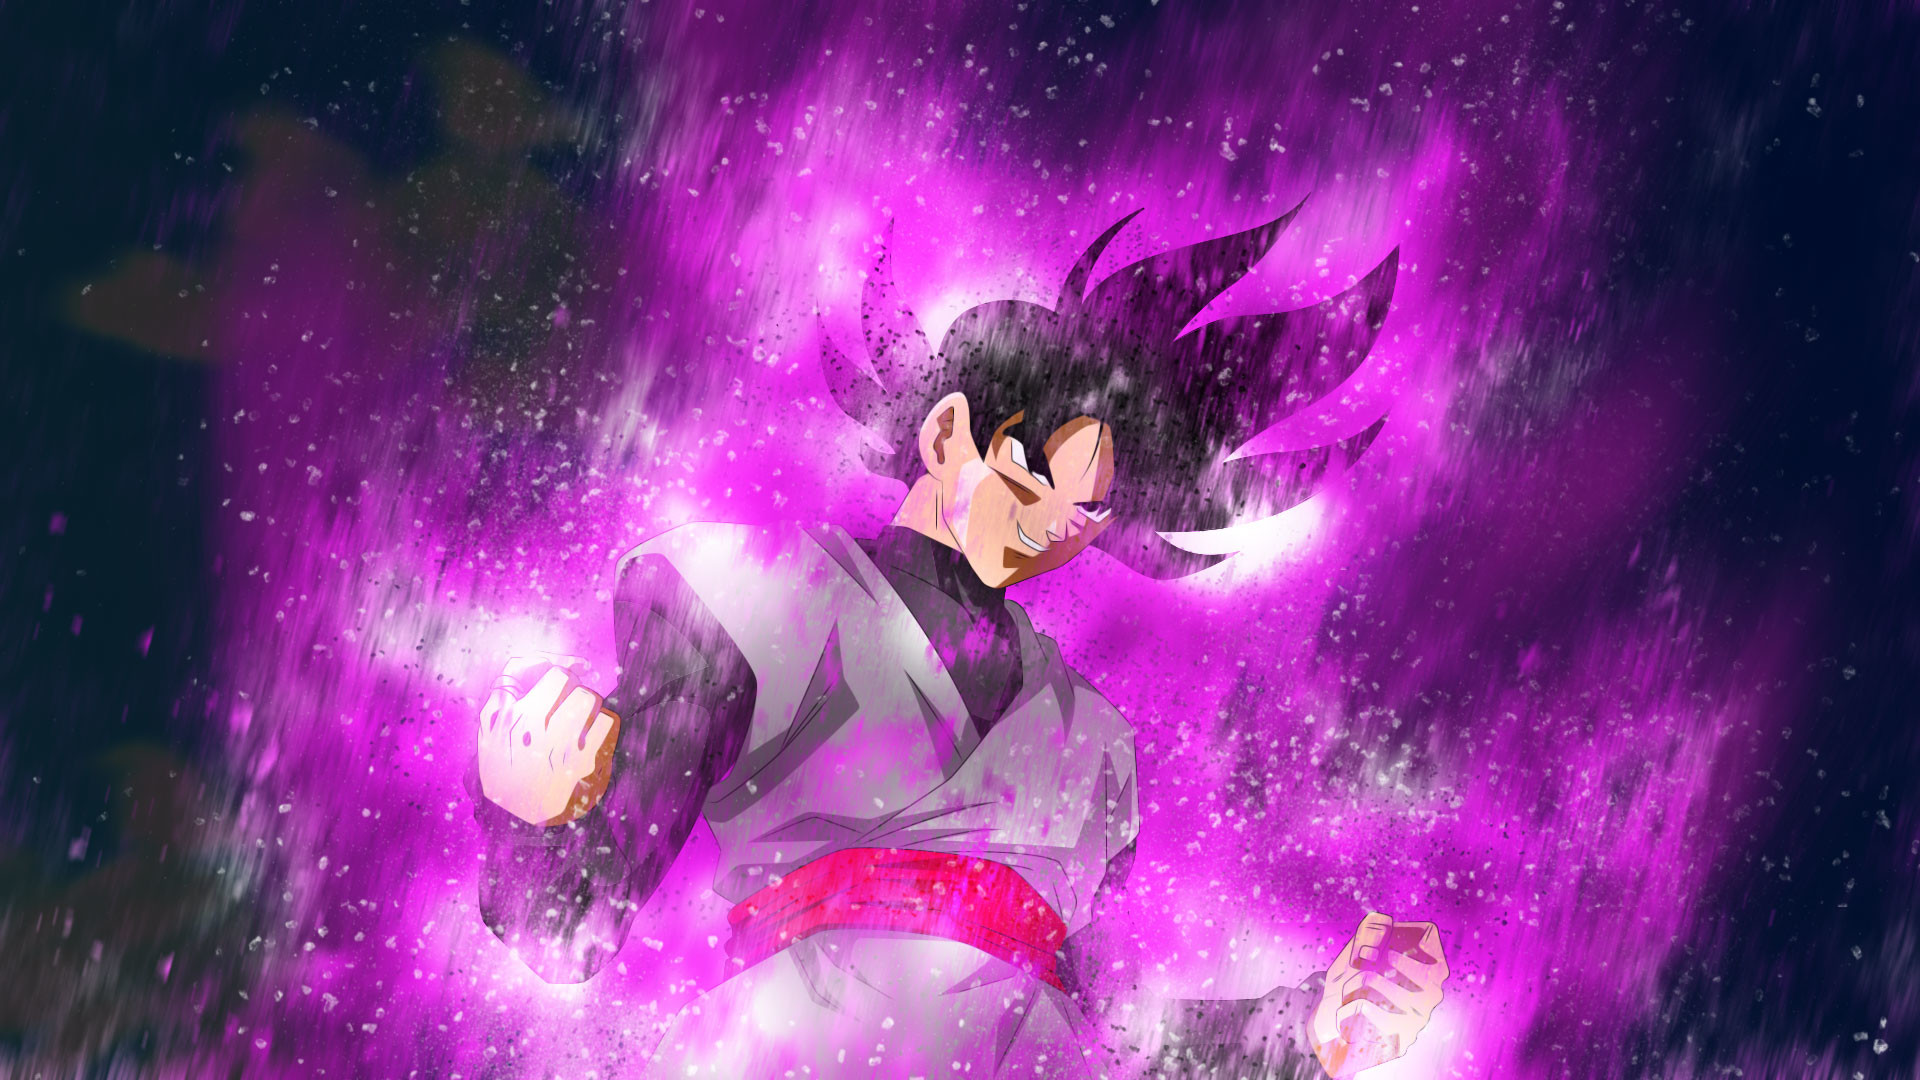 black-goku-hd-wallpaper-dragon-ball-super-backgrounds-